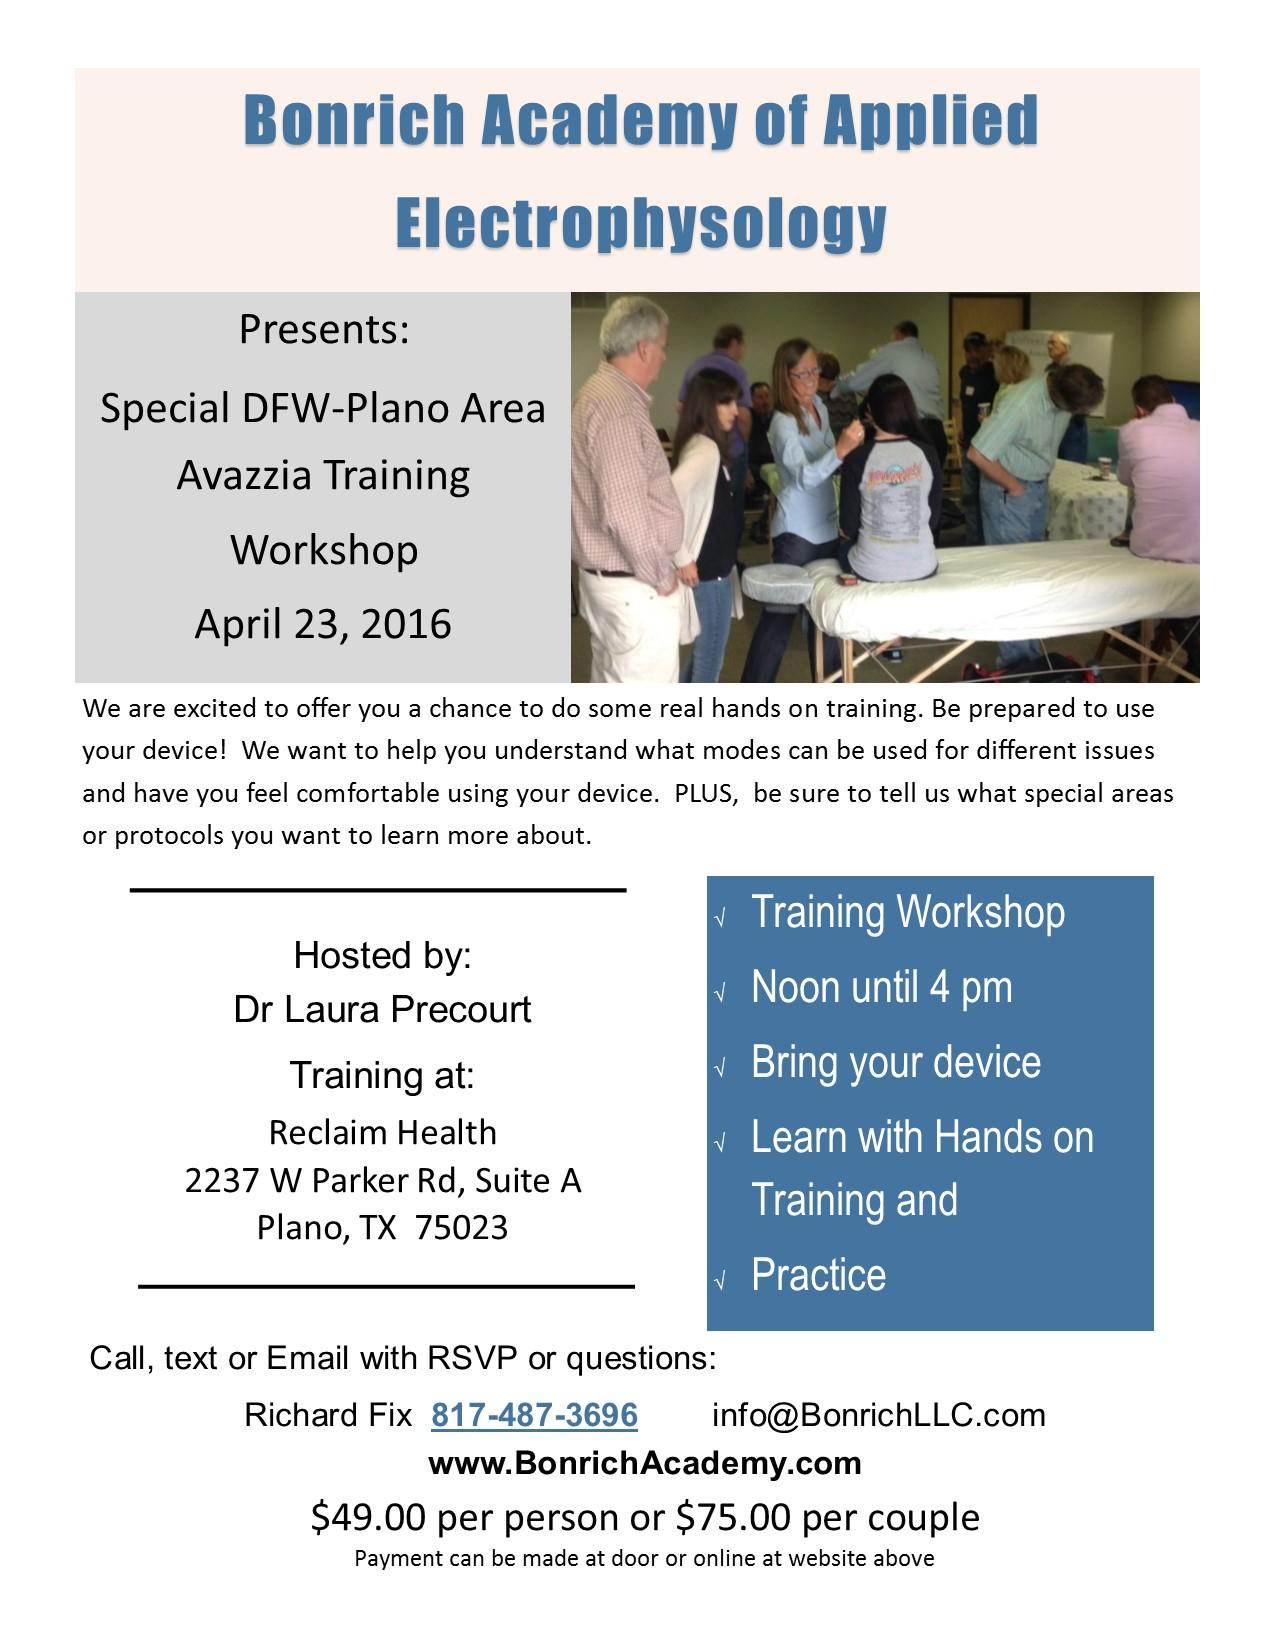 Bonrich Academy of Electrophysiology